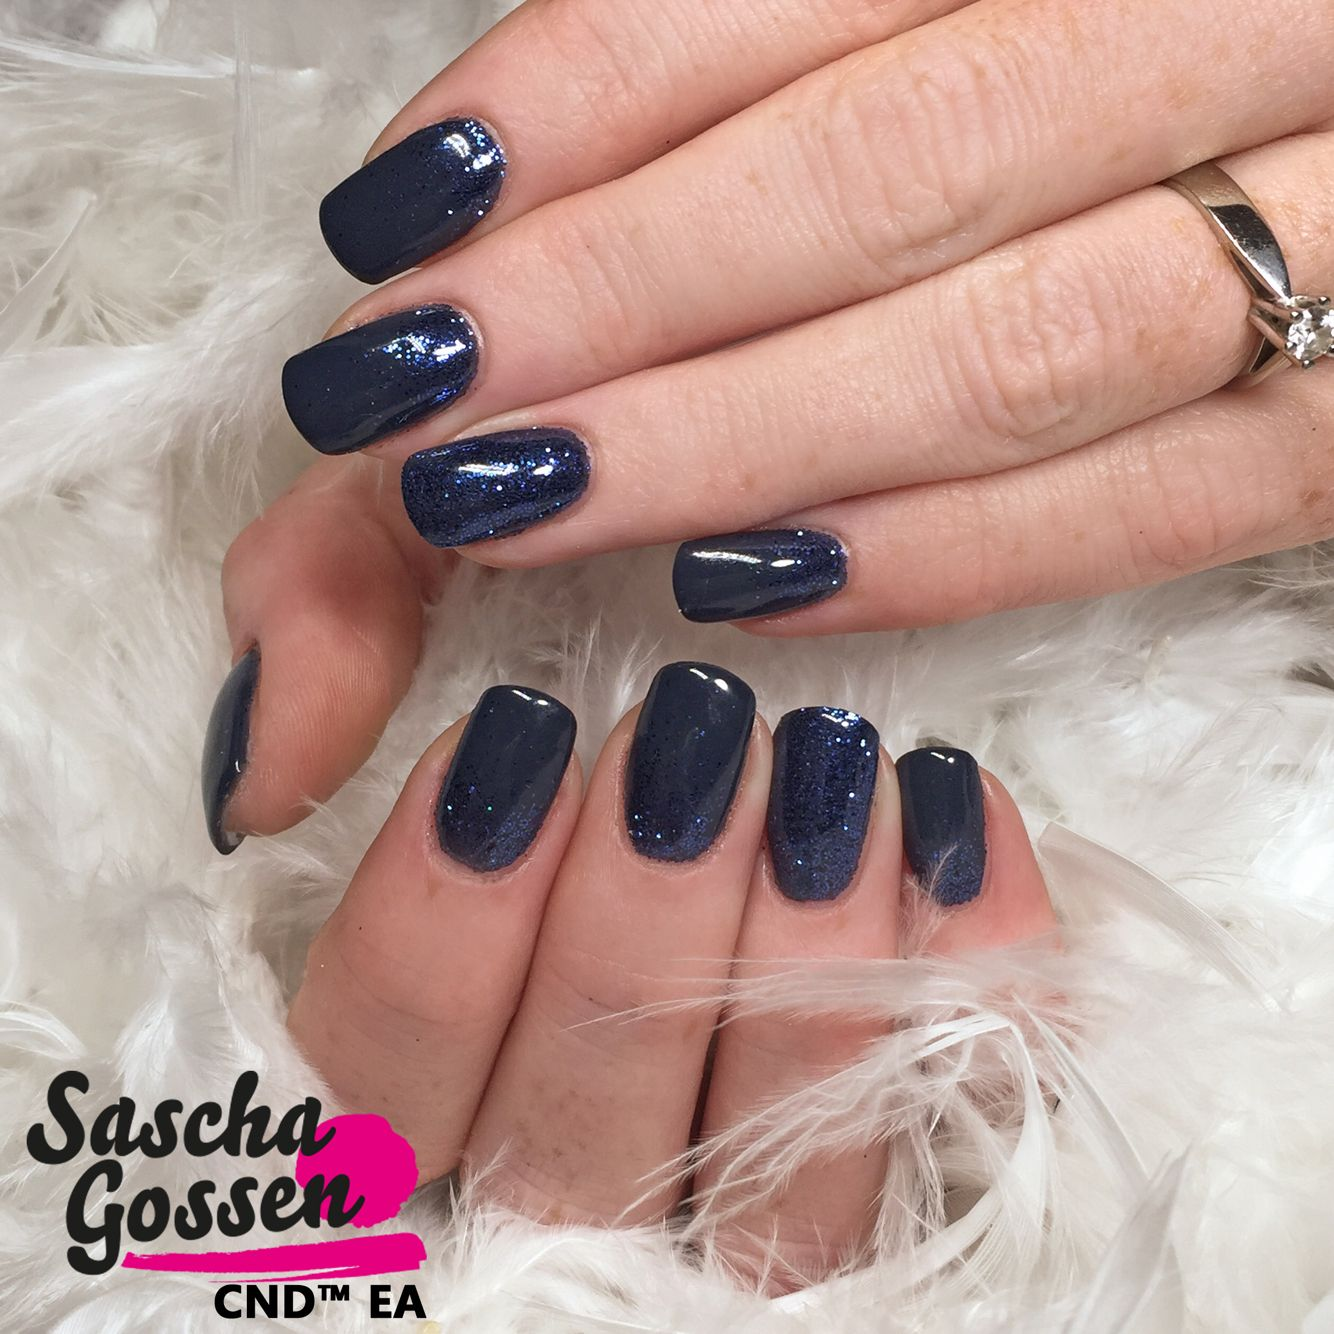 Just the beautiful color Indigo Frock with Lecenté glitters. #CND #cndea #colors #cndworld #cndshellac #cndgowithapro #Lecenté #glitter #nails #nailart #style #SHELLAC #nailart #nailpro #nails2inspire #instanails #inspiration #nailstagram @cndworld @laprofilique @lovelecente